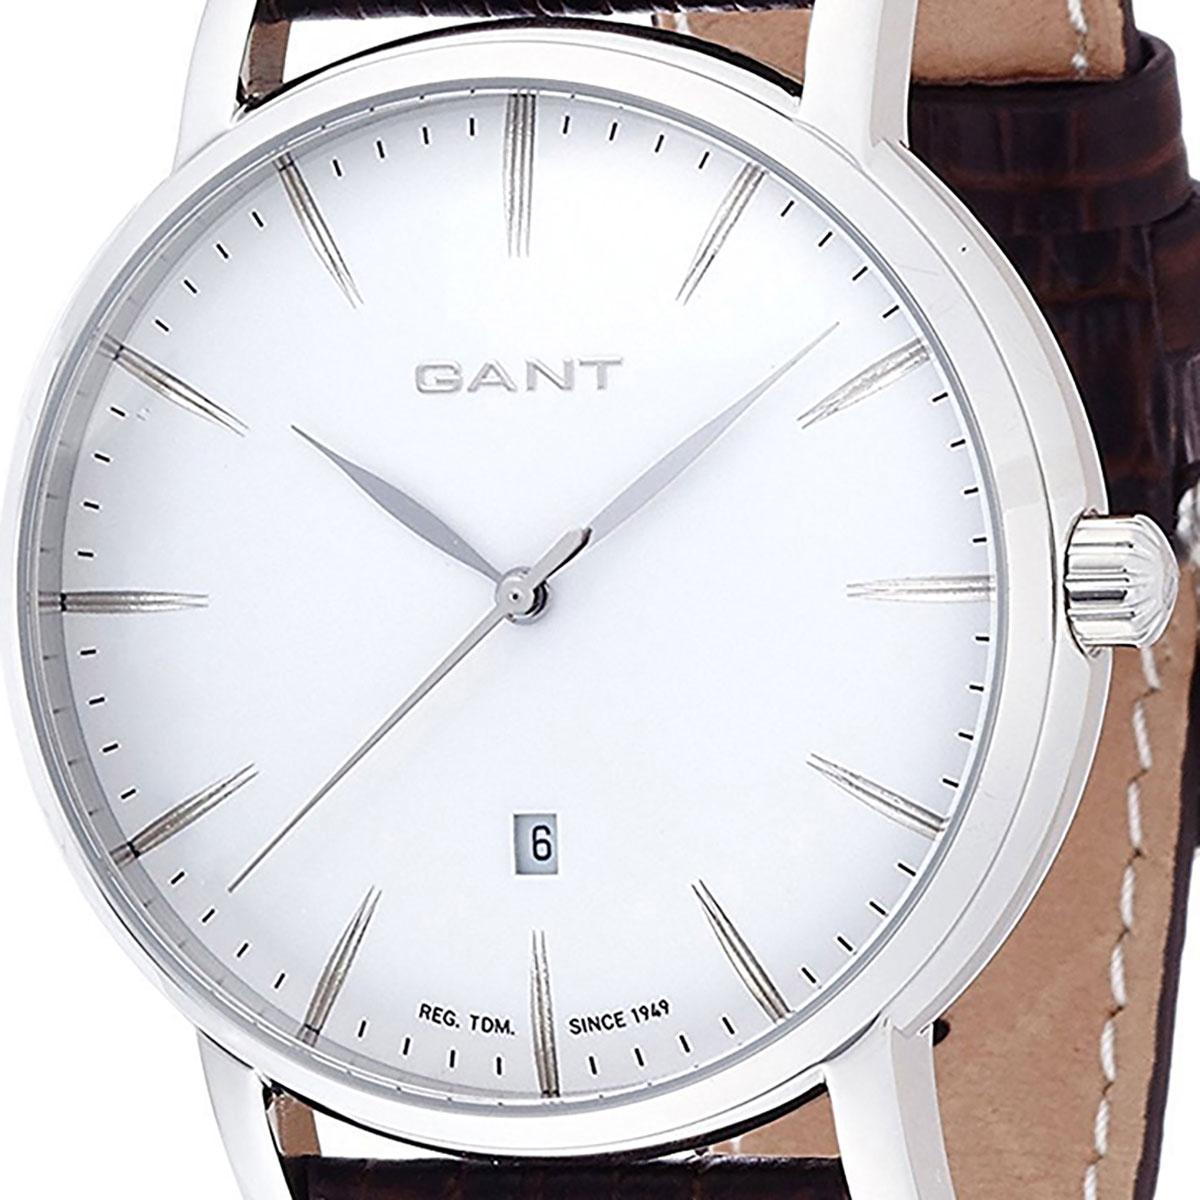 GANT ガント 電池式クォーツ 腕時計 [W70432] 並行輸入品 ホワイト(白)